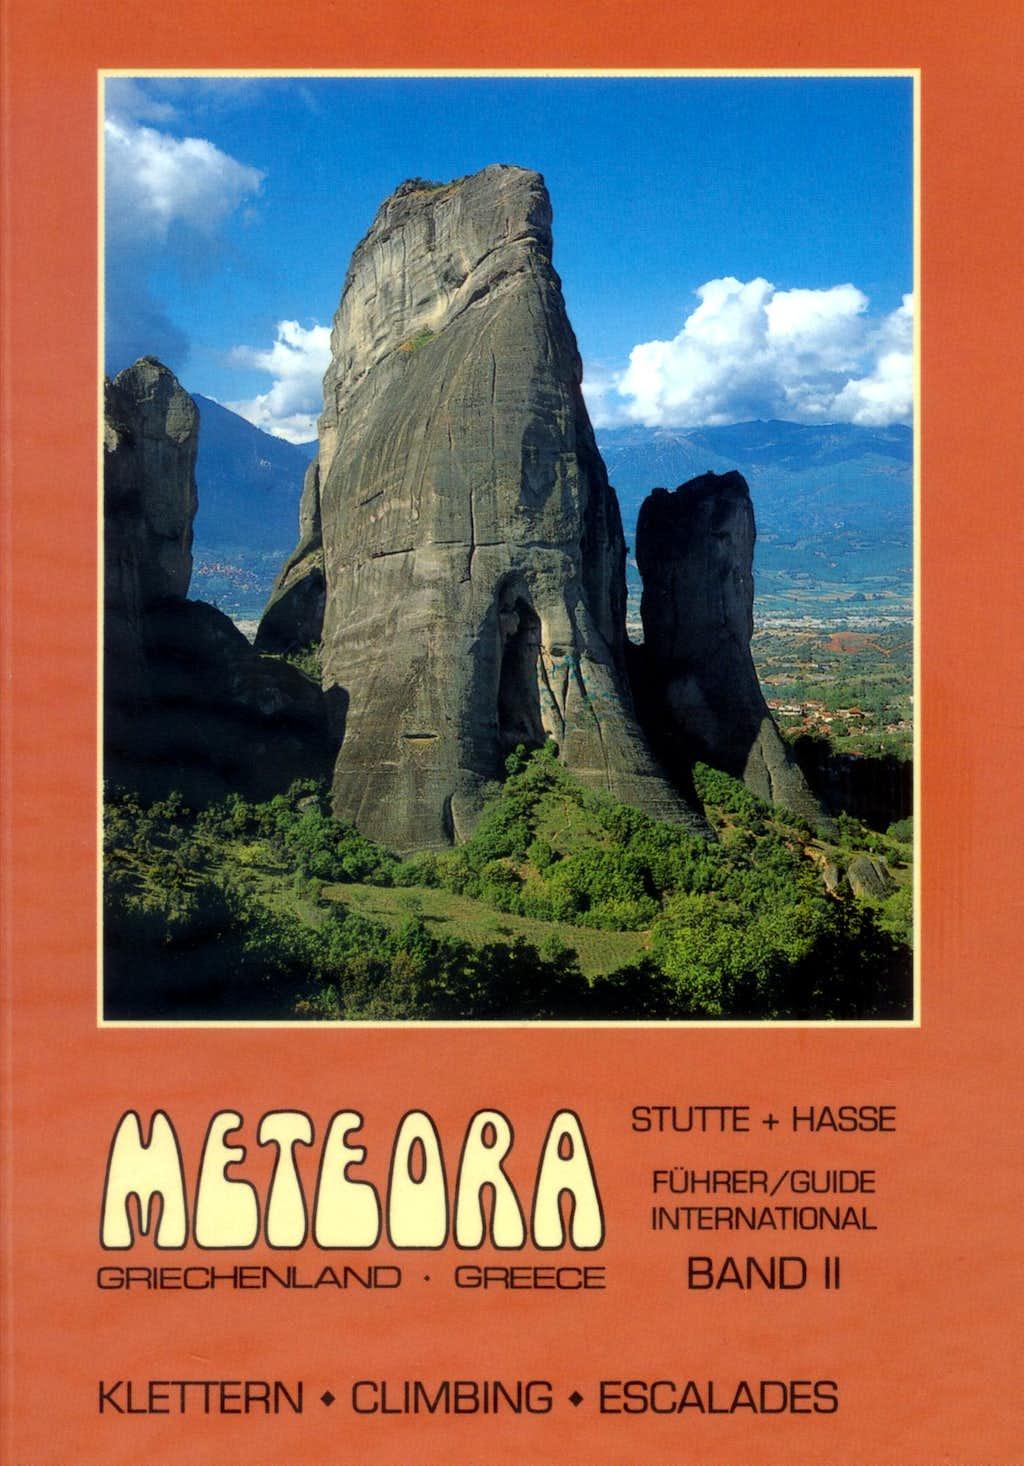 Meteora Guidebook